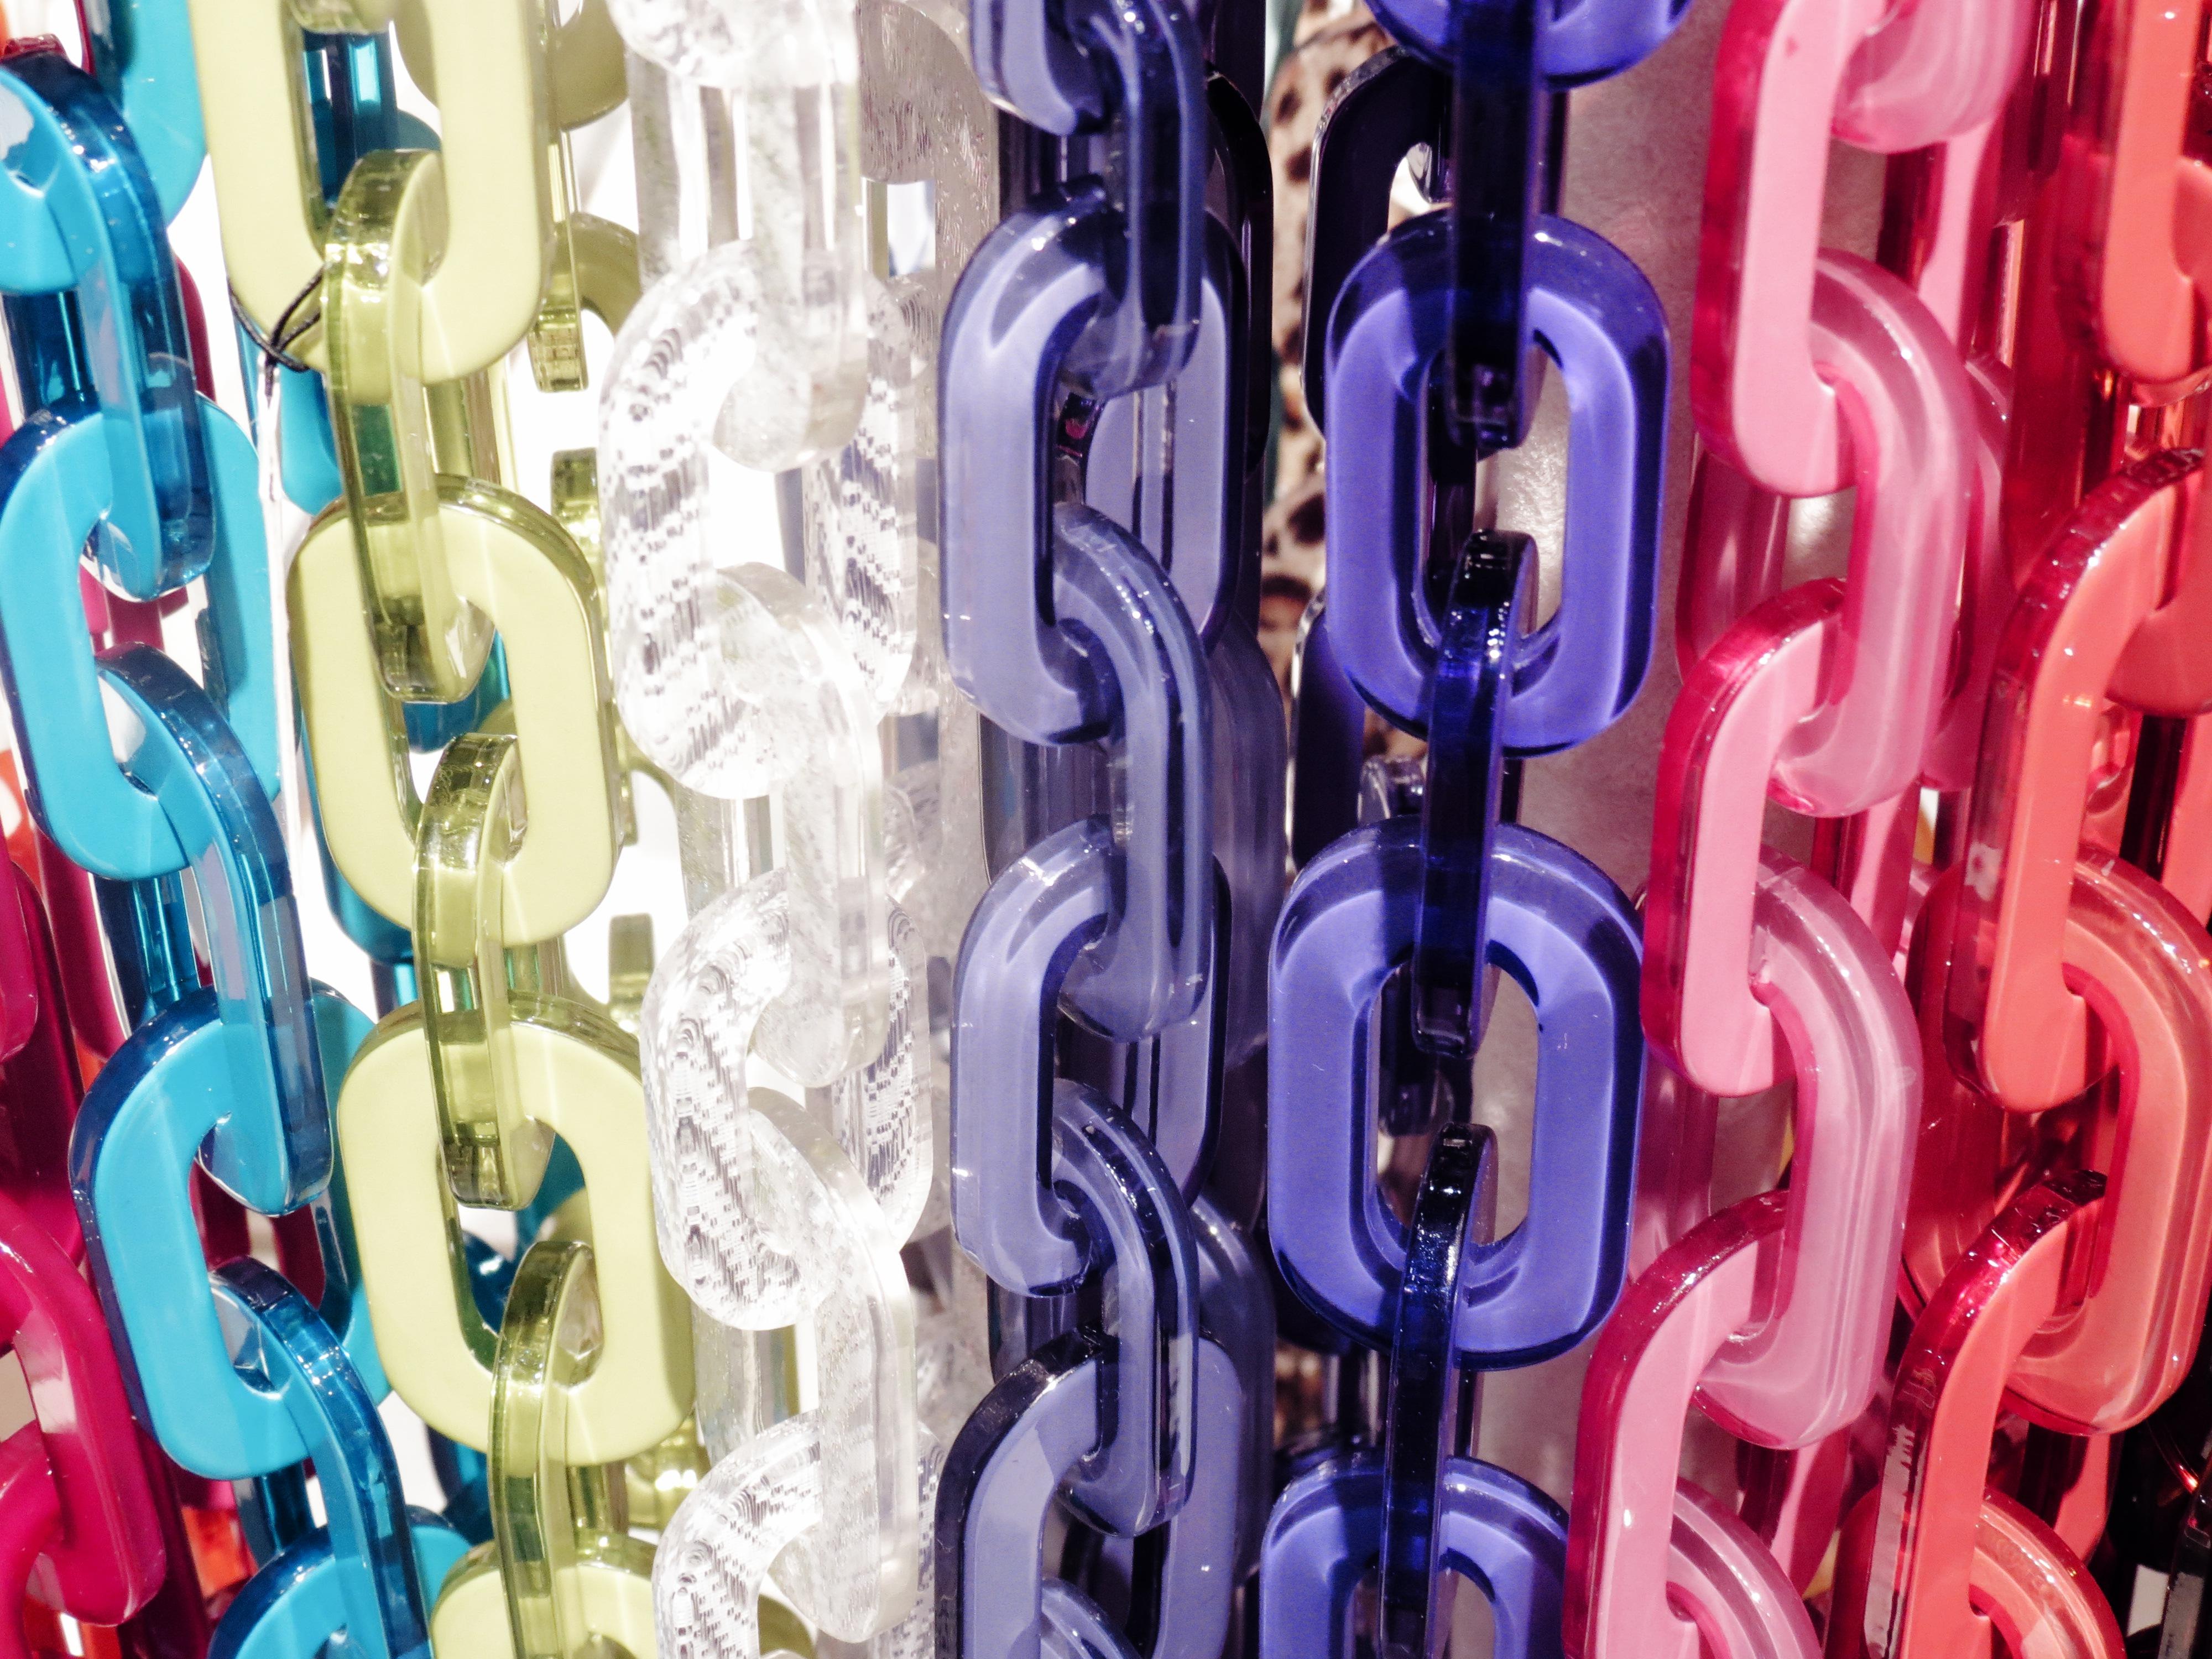 Plastic Necklaces